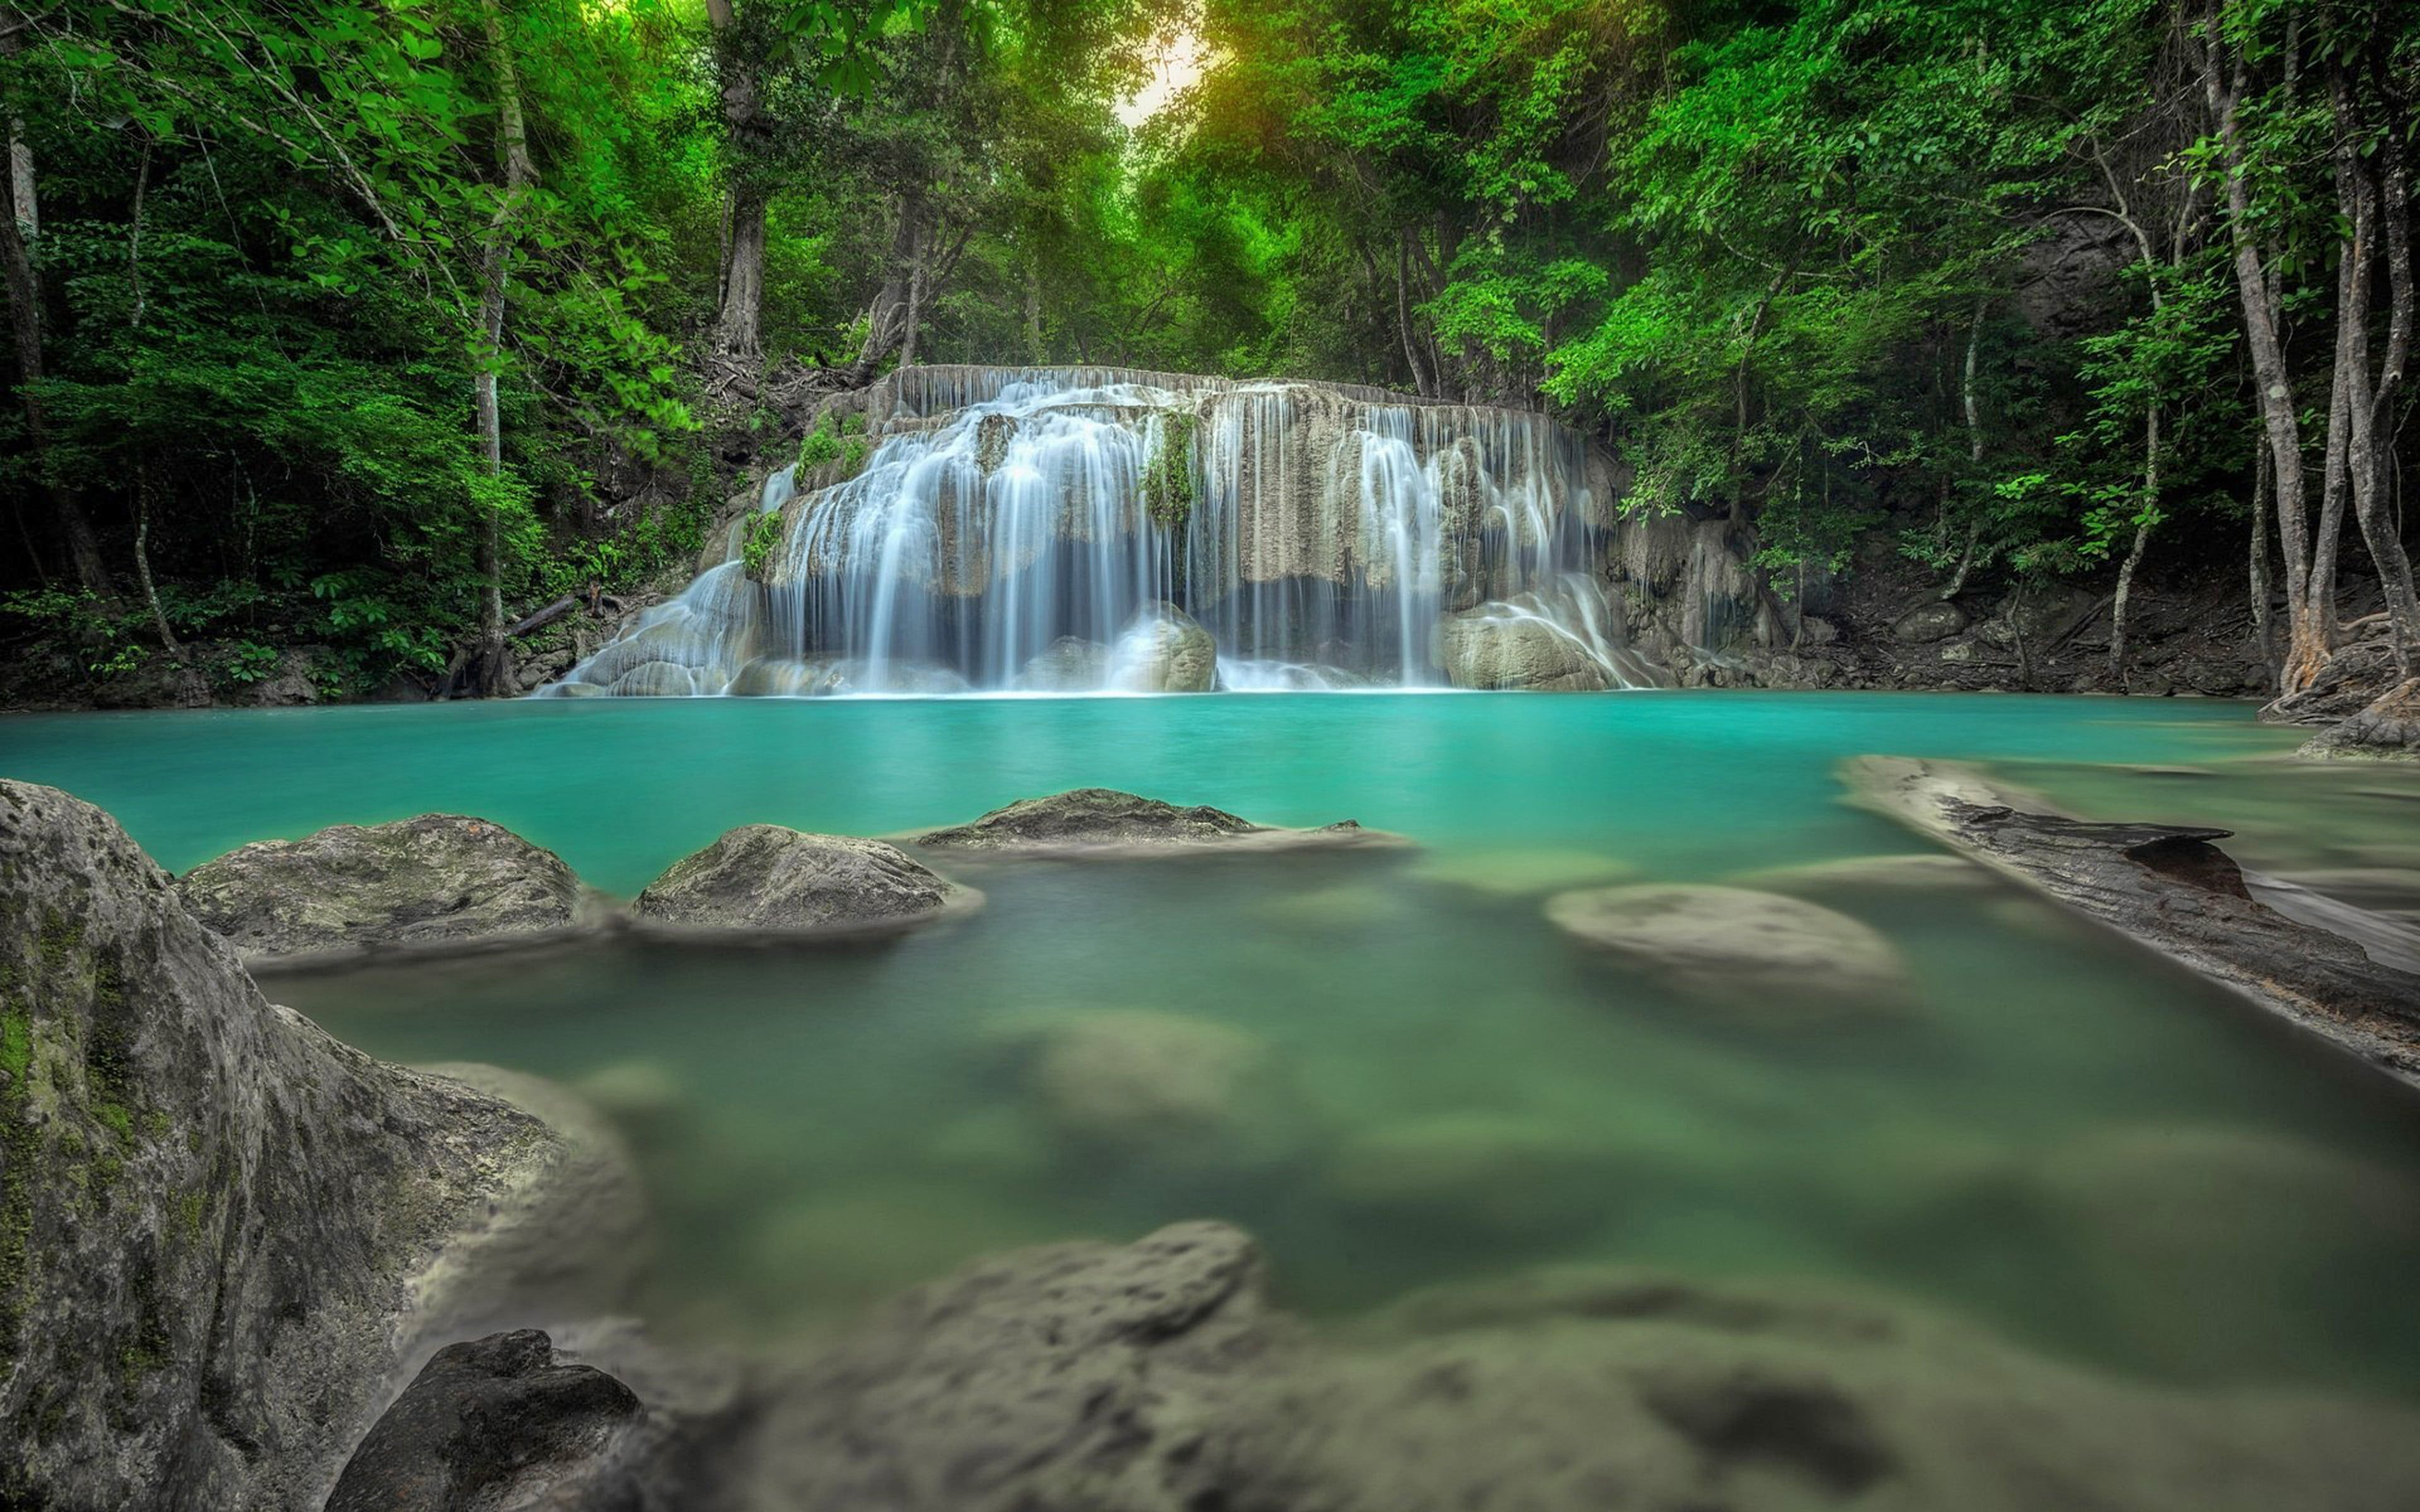 Erawan Waterfall In Thailand Jungle Rain Forest Rocks In Water